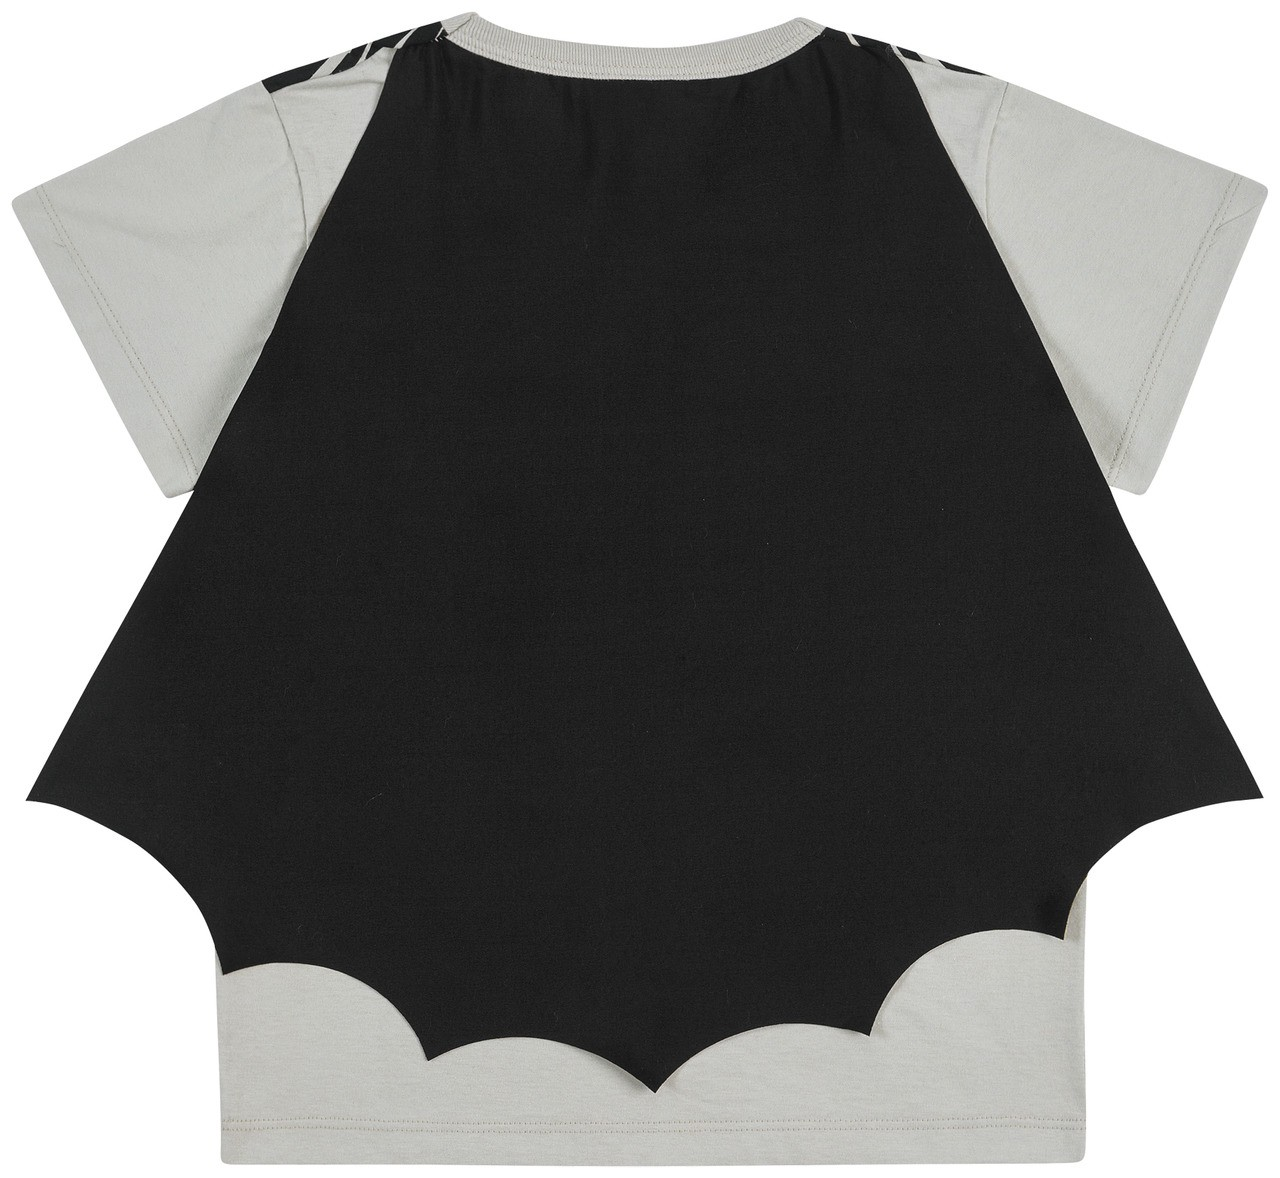 Camiseta Infantil Verão Menino Batman - Kamylus